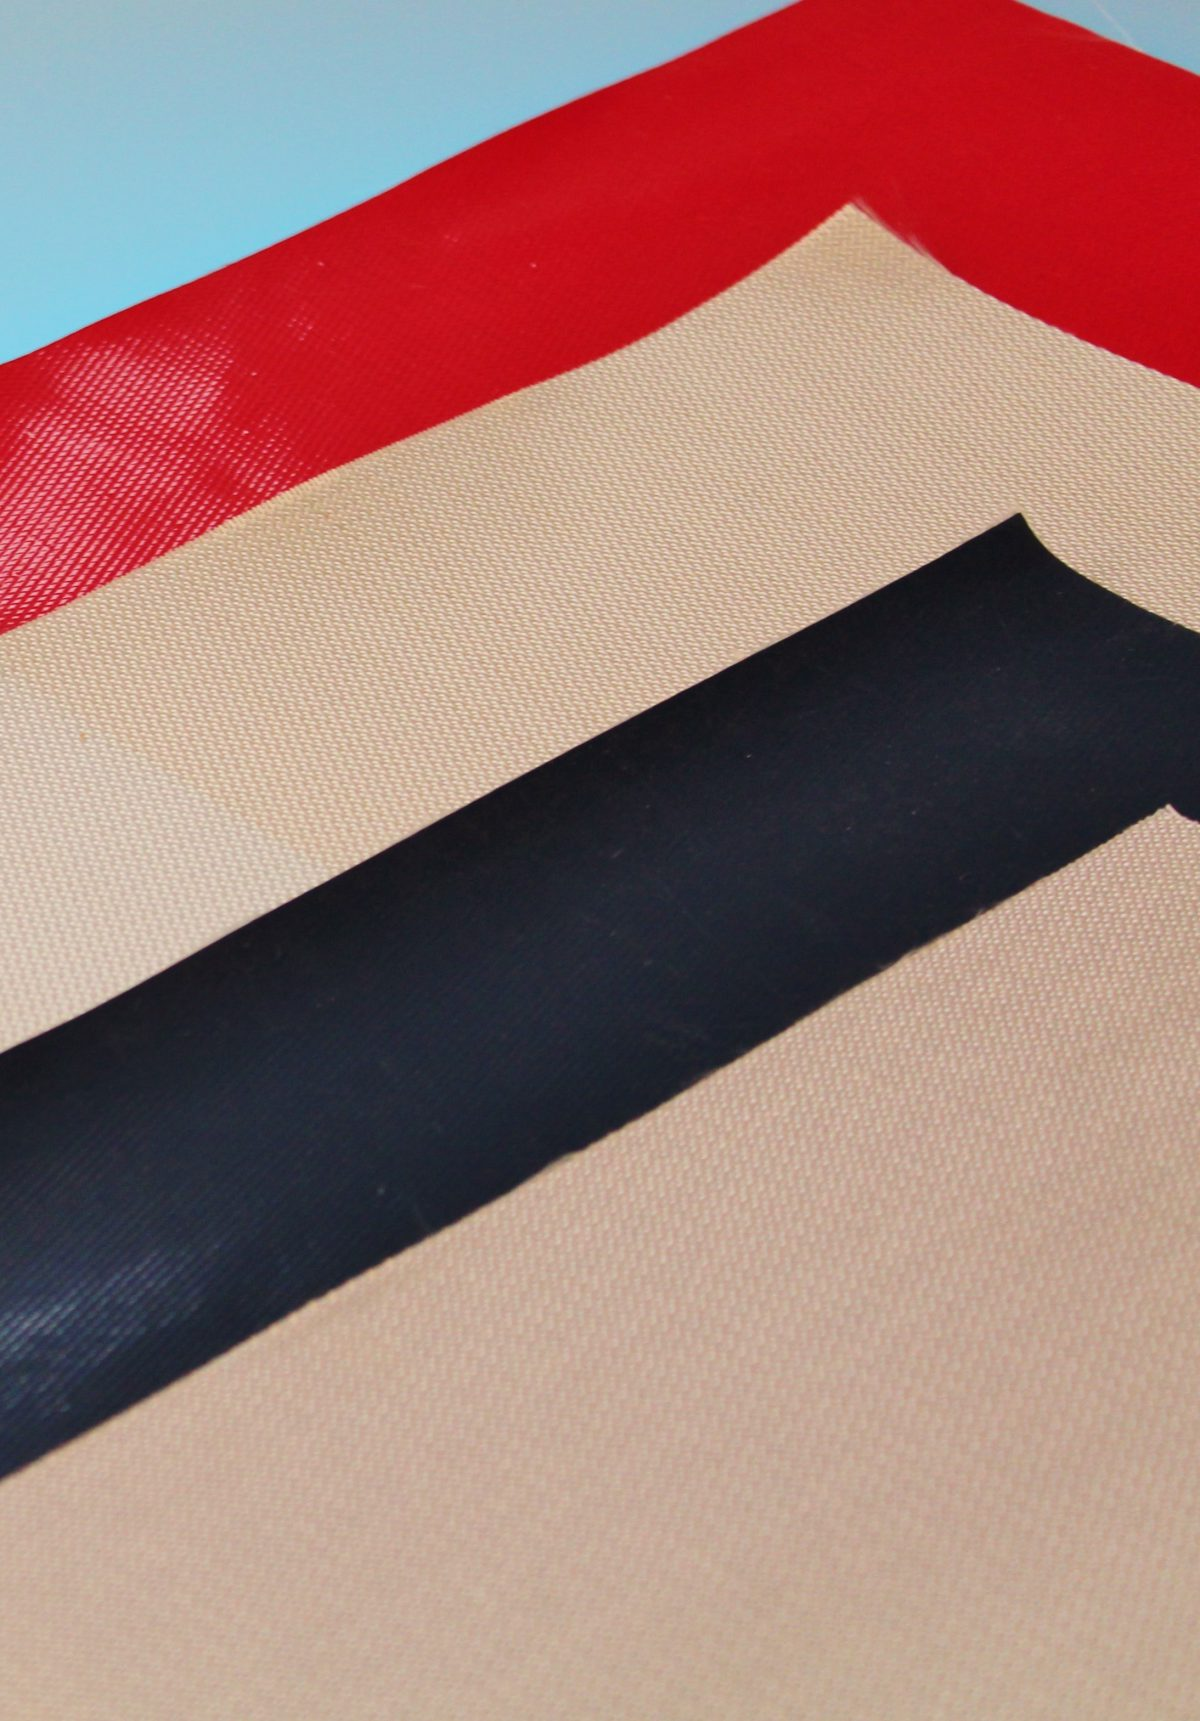 Insertion-Sheet-EMI-Seals-Gaskets